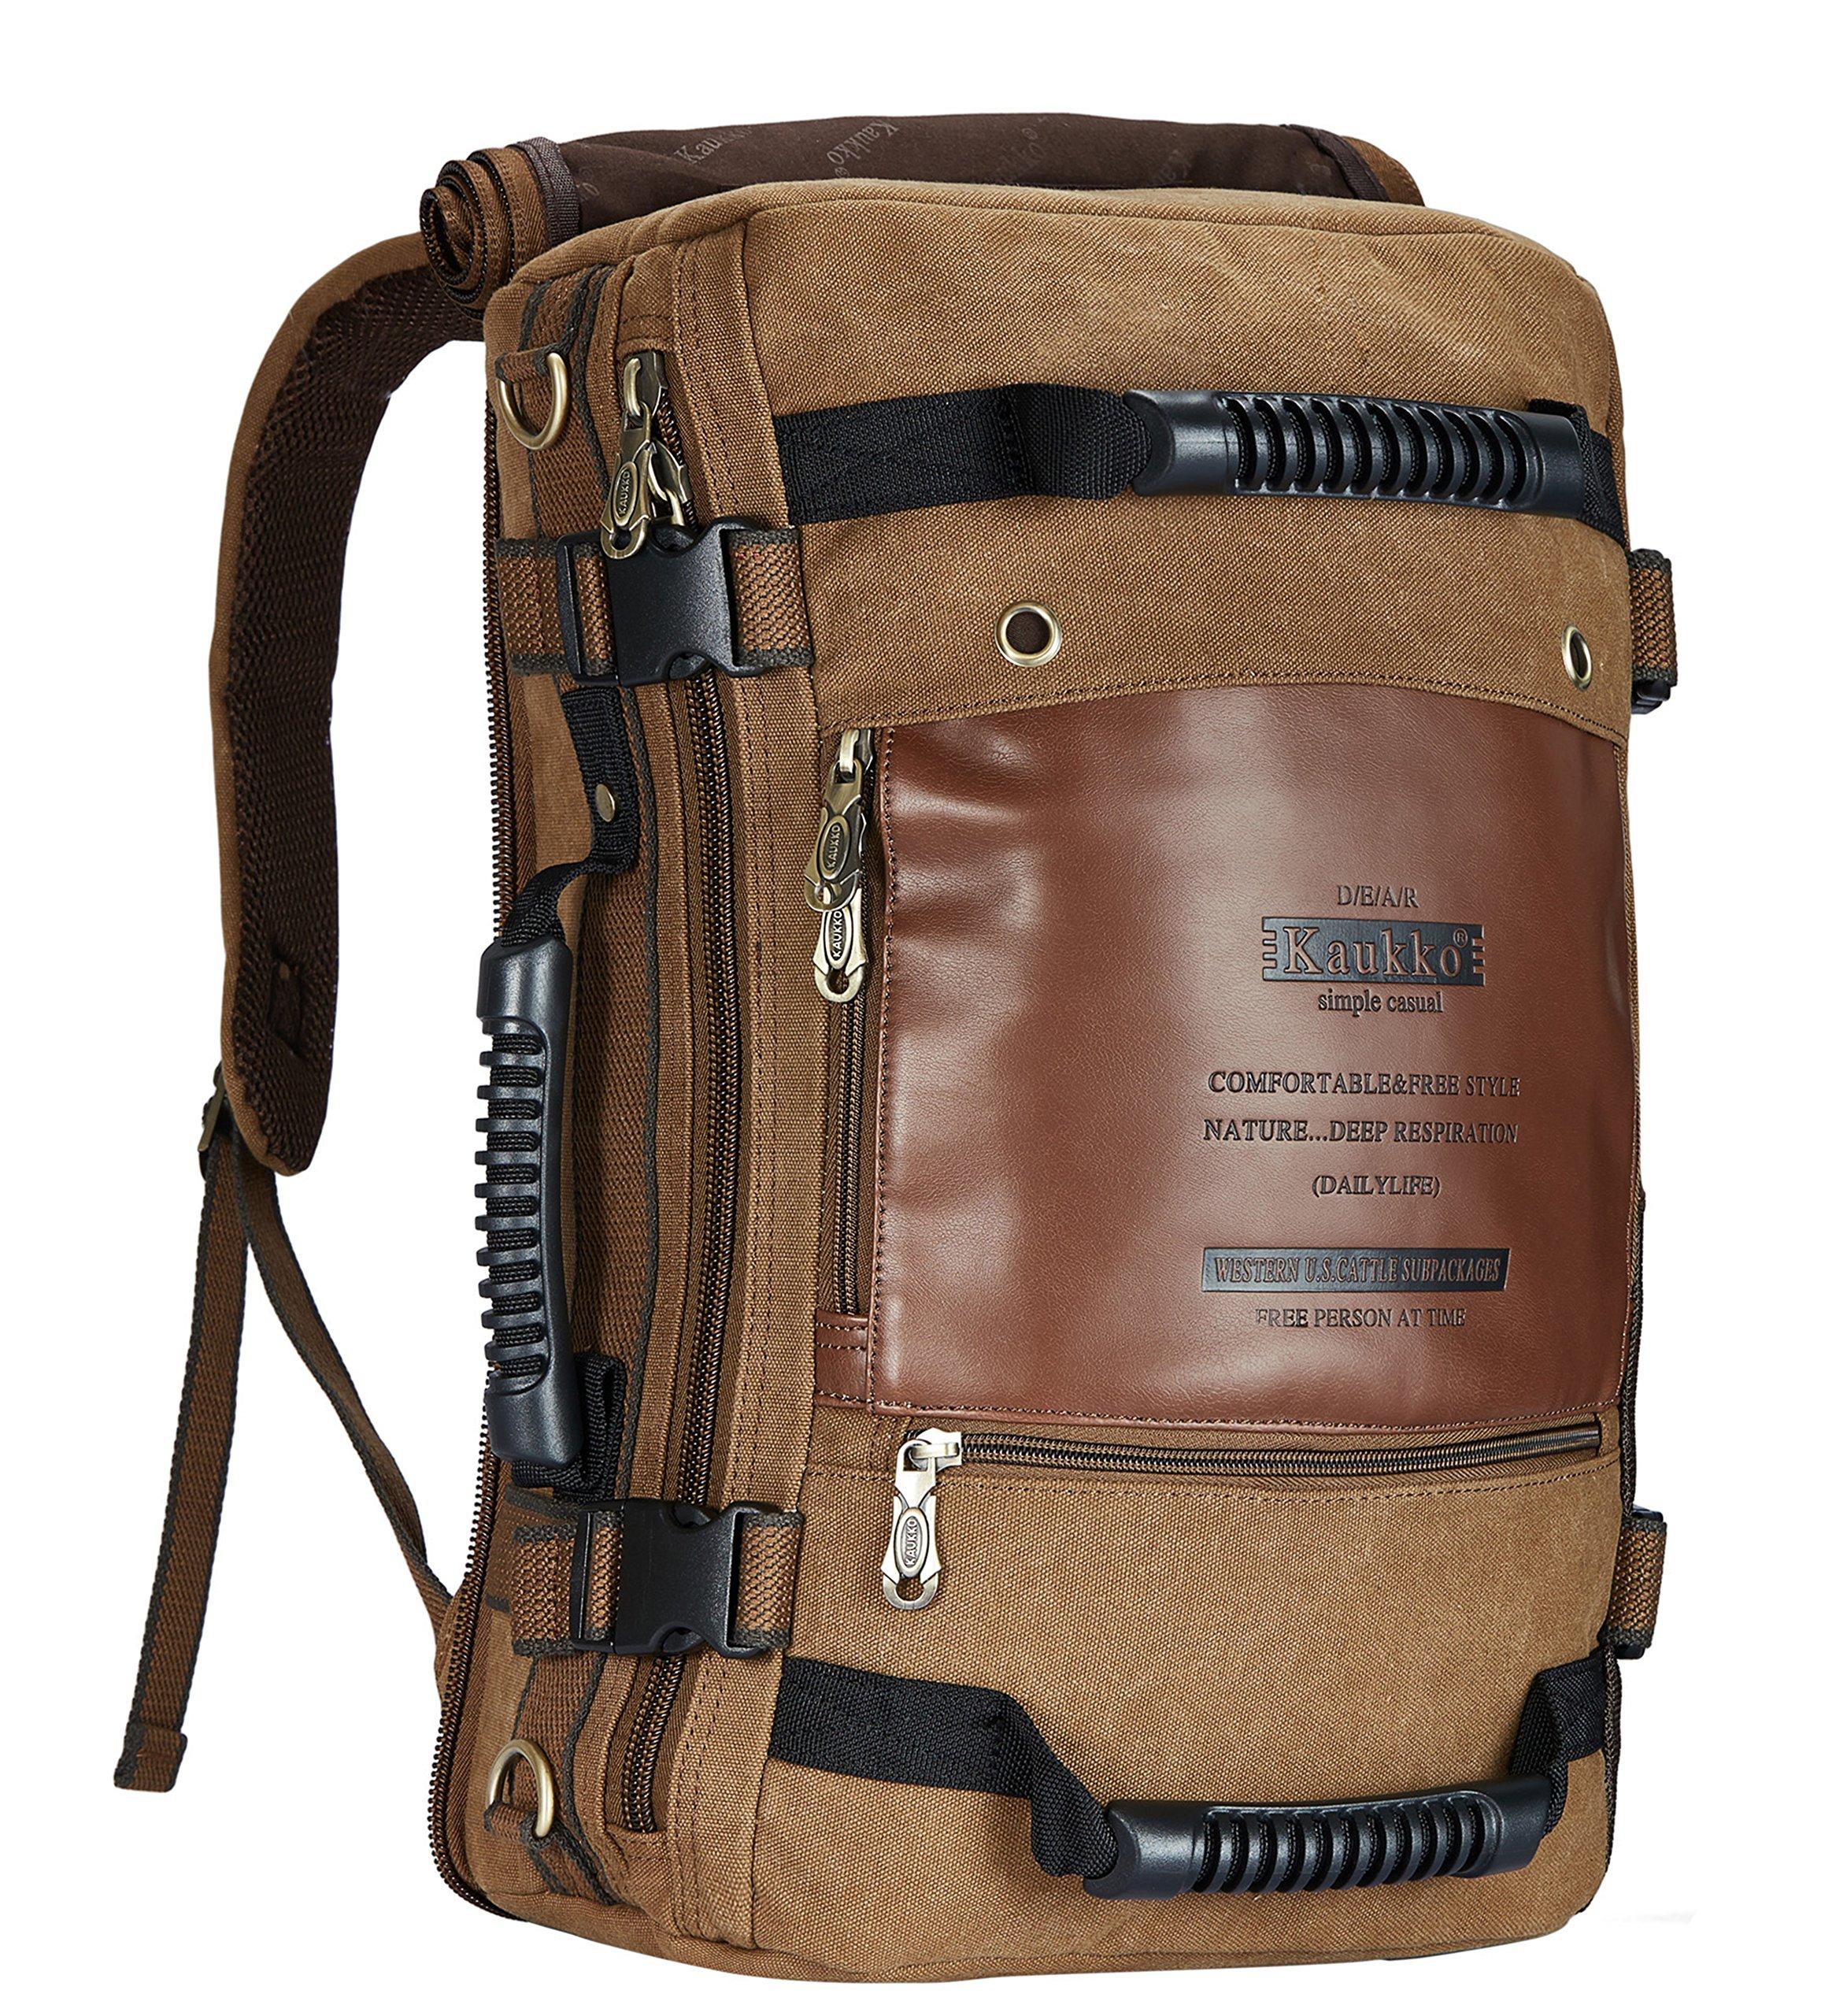 Kaukko Bags - KAUKKO Outdoor Travel Men Backpack e552620166ab5